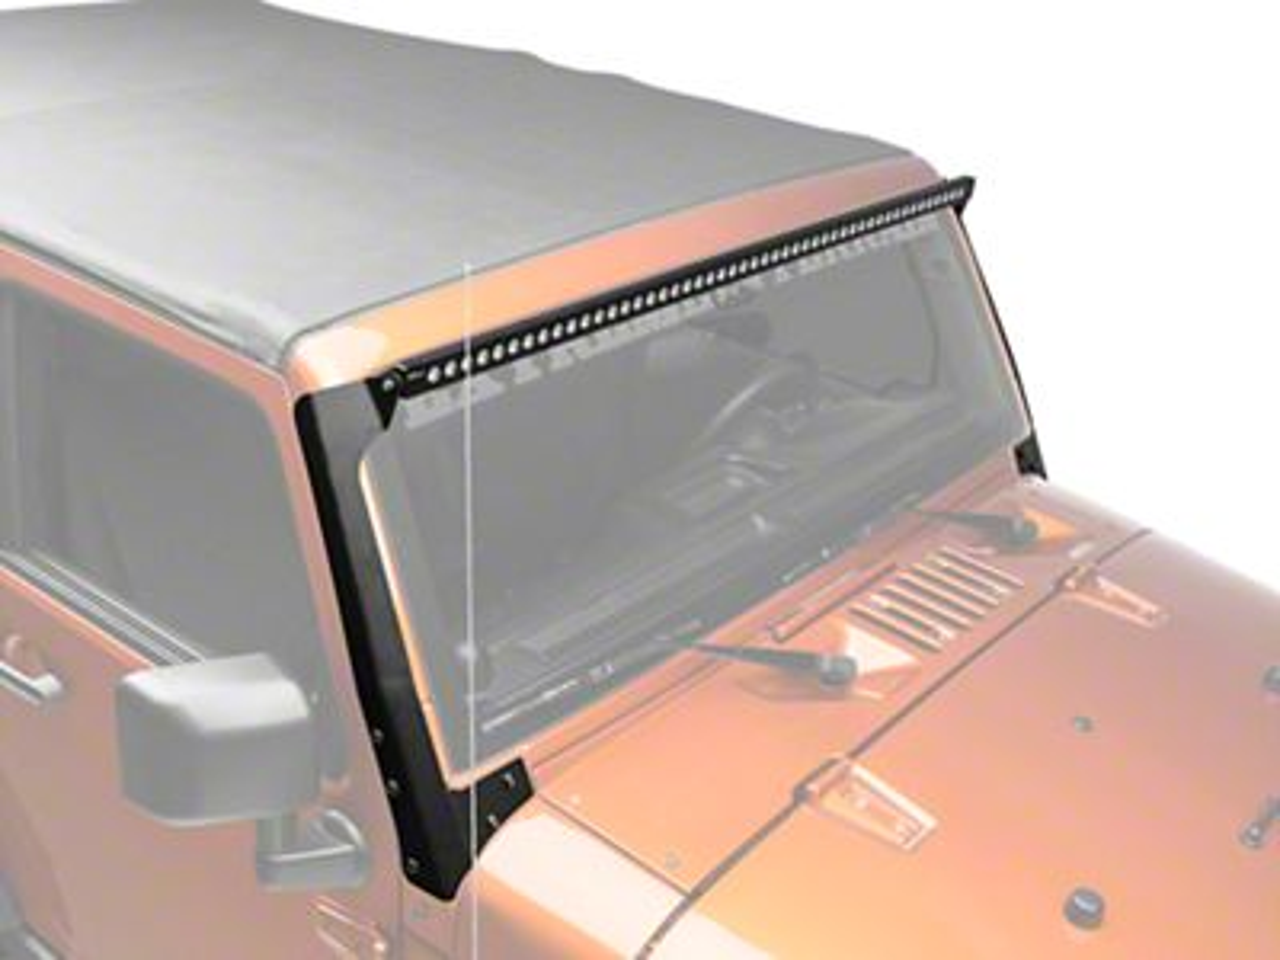 Putco 50 in. Luminix LED Light Bar w/ Windshield Mounting Brackets (07-18 Jeep Wrangler JK)